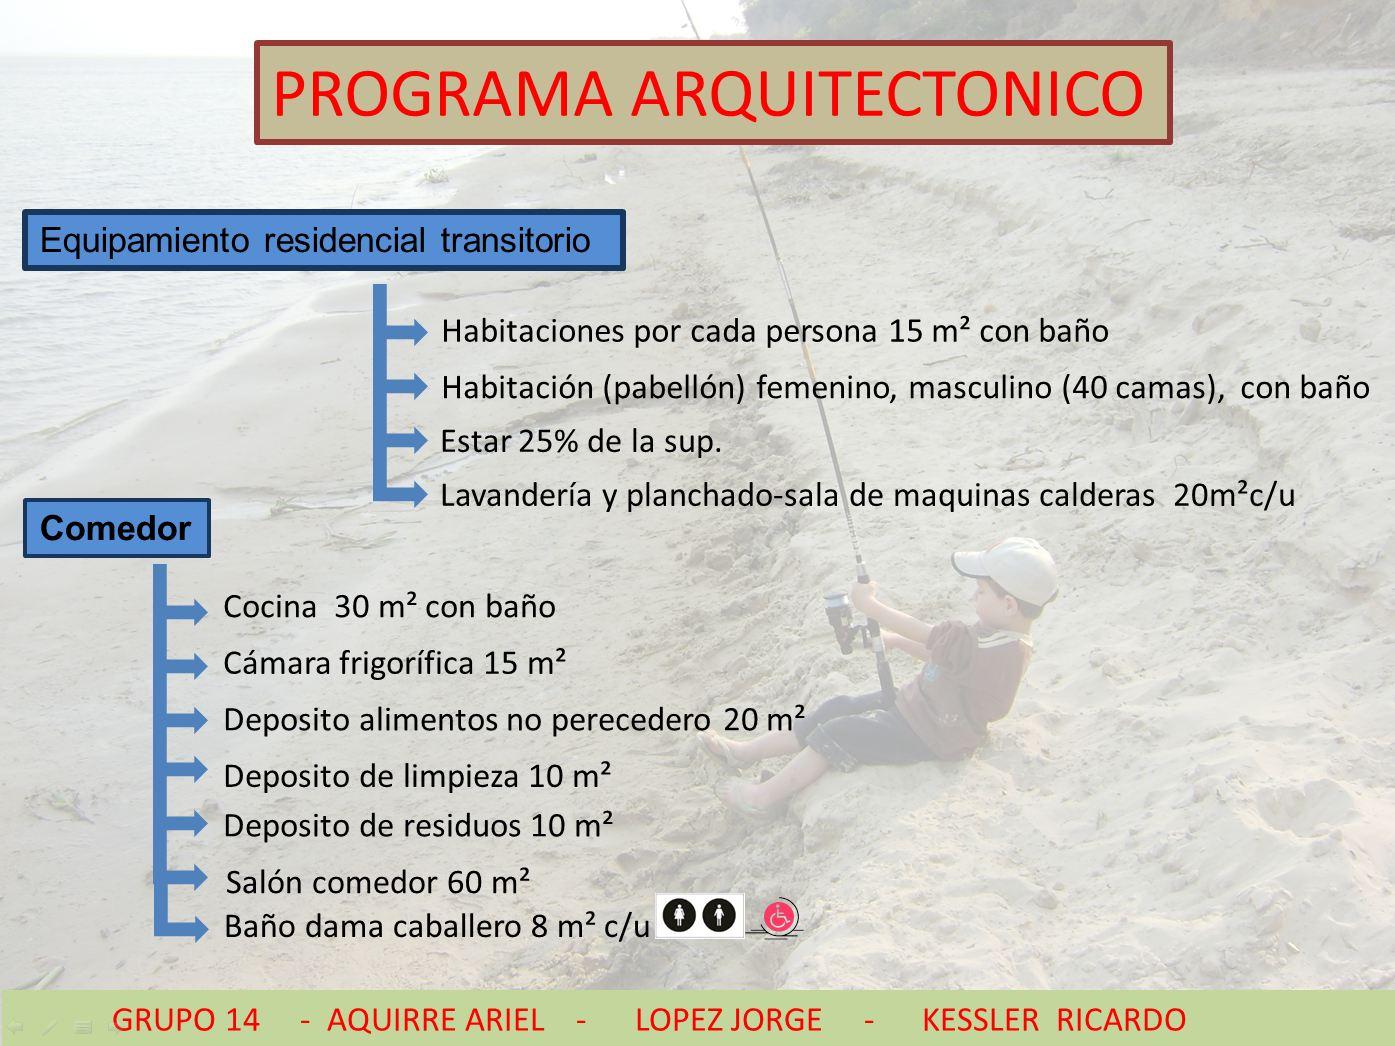 Arquitectura4 upa grupo 14 programa arquitectonico for Programa arquitectonico